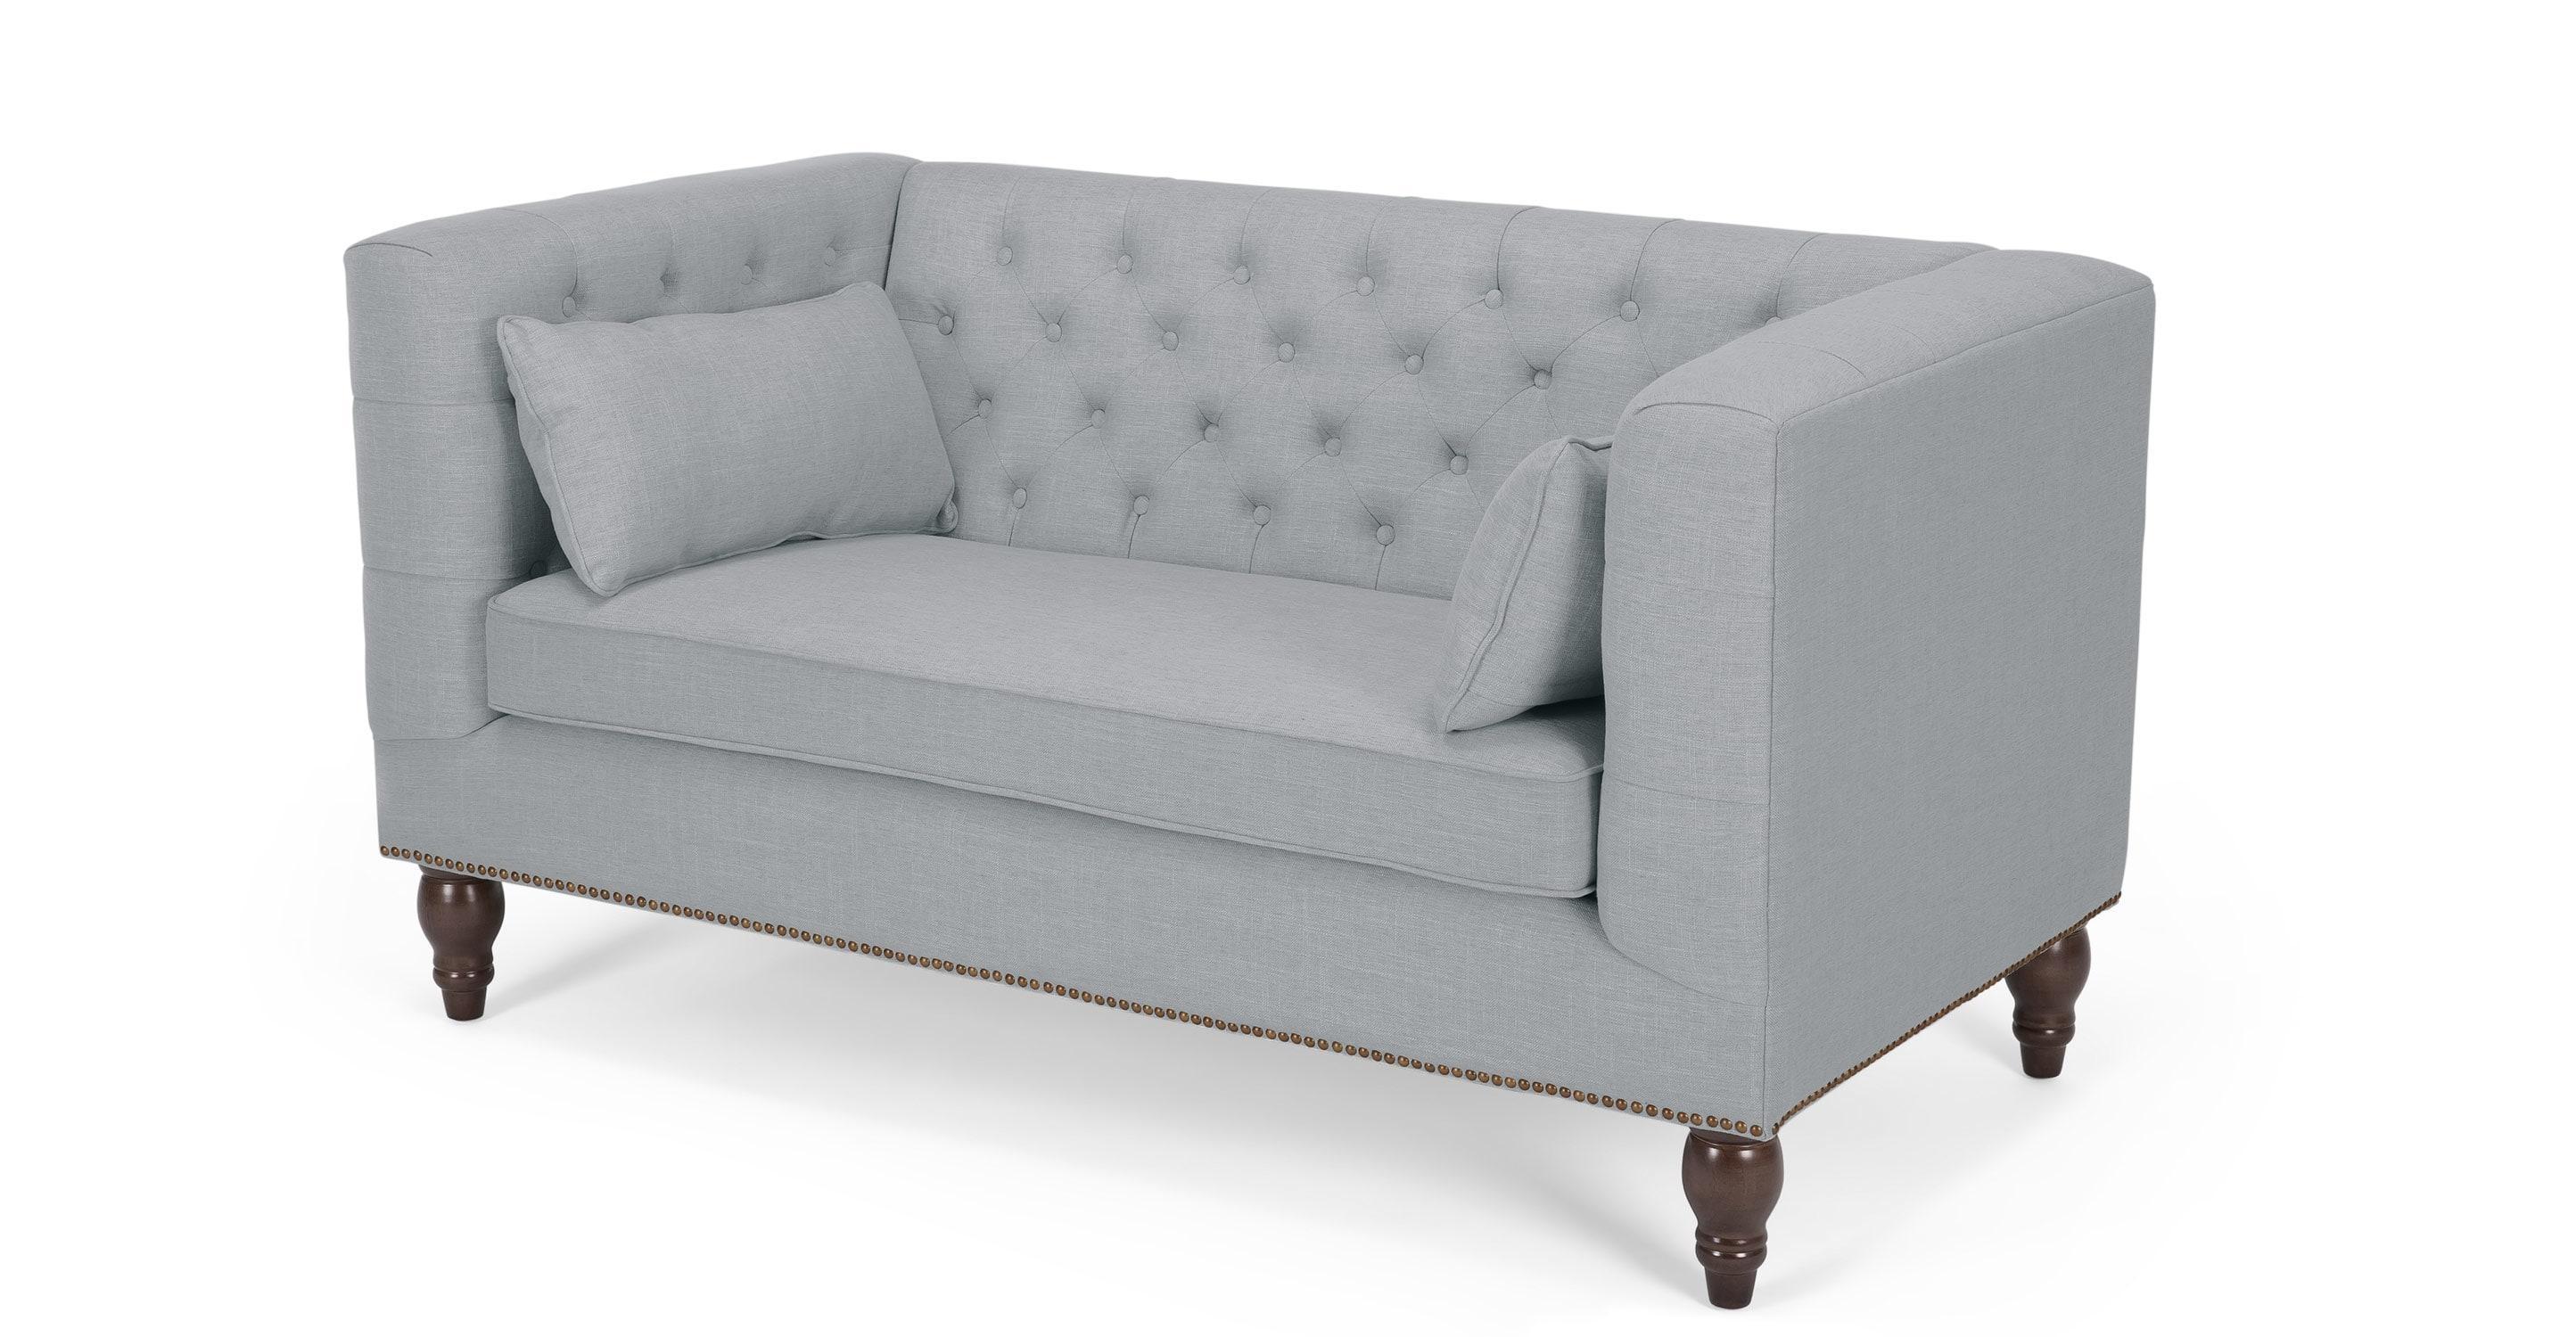 20 best small 2 seater sofas sofa ideas. Black Bedroom Furniture Sets. Home Design Ideas